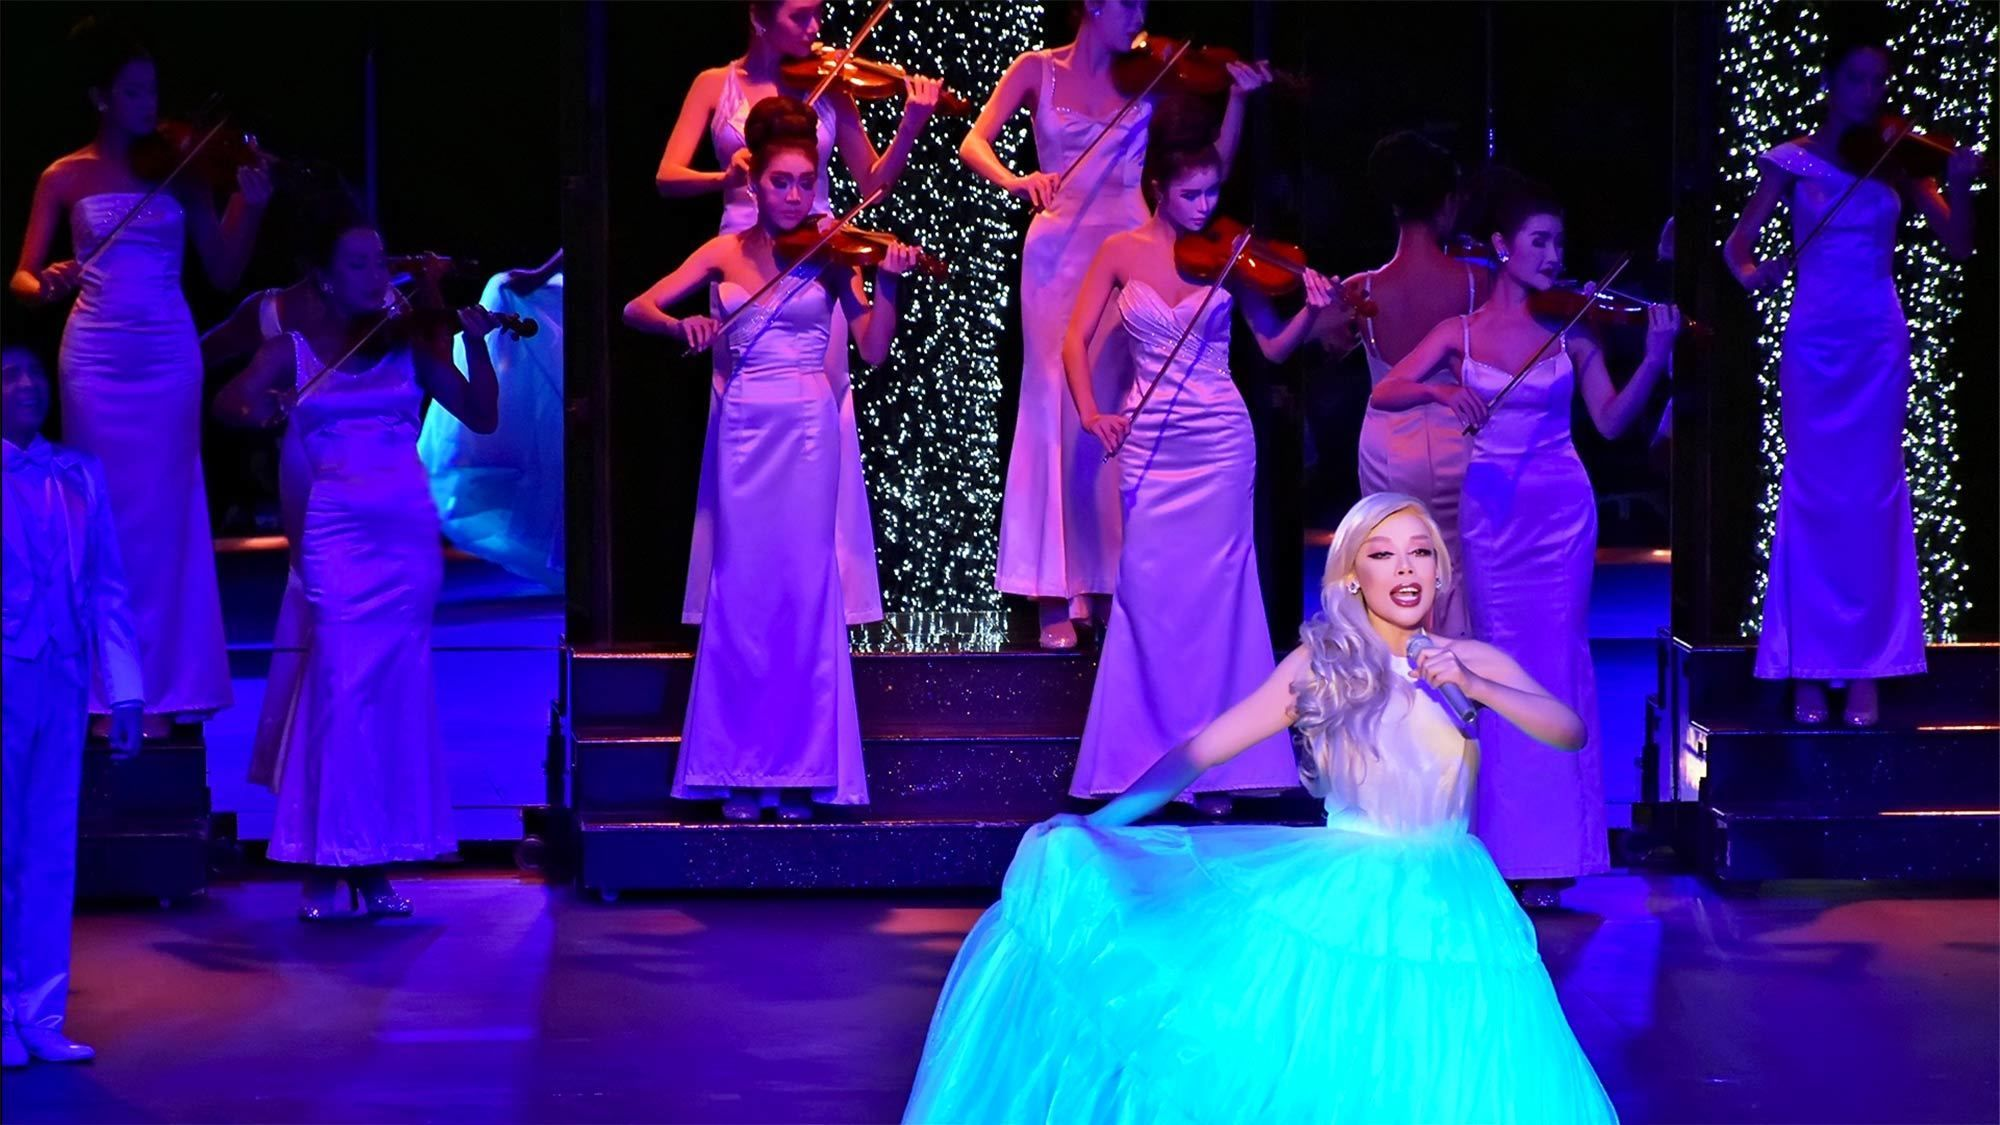 Performer in a bight blue dress at the Calypso Bangkok Cabaret Show in Bangkok, Thailand